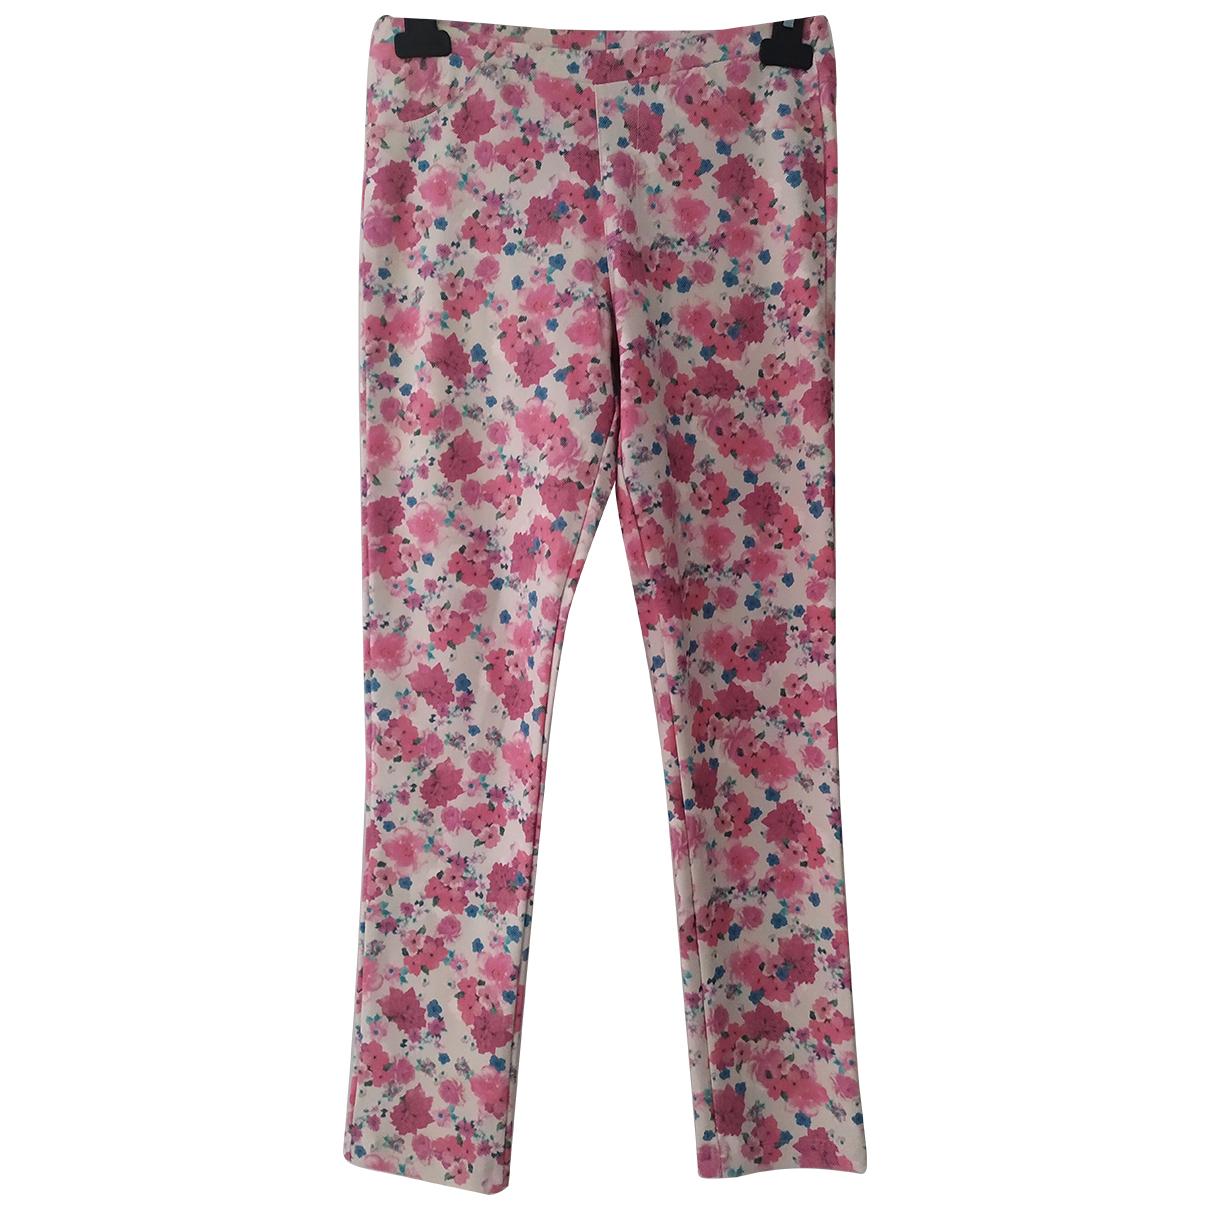 Zara - Pantalon   pour enfant en elasthane - multicolore